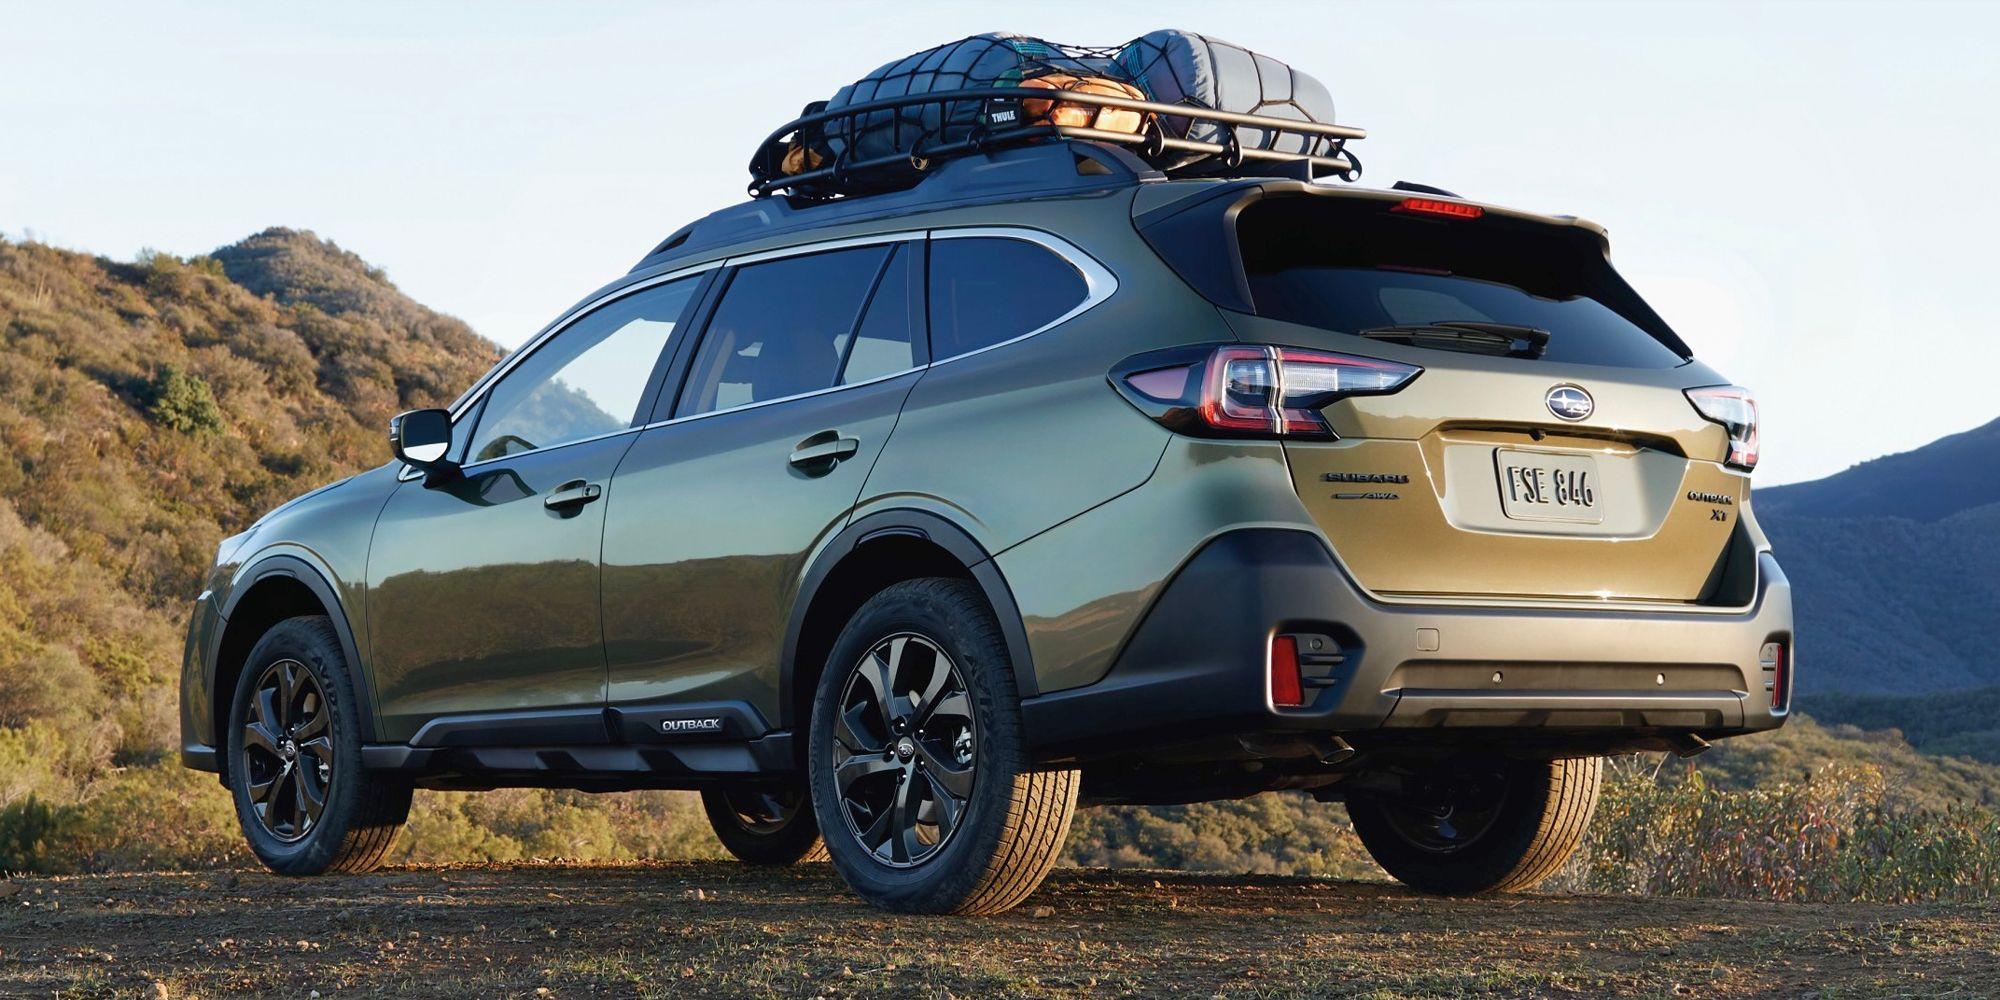 10 Best Crossover SUVs To Buy Under $30,000 New